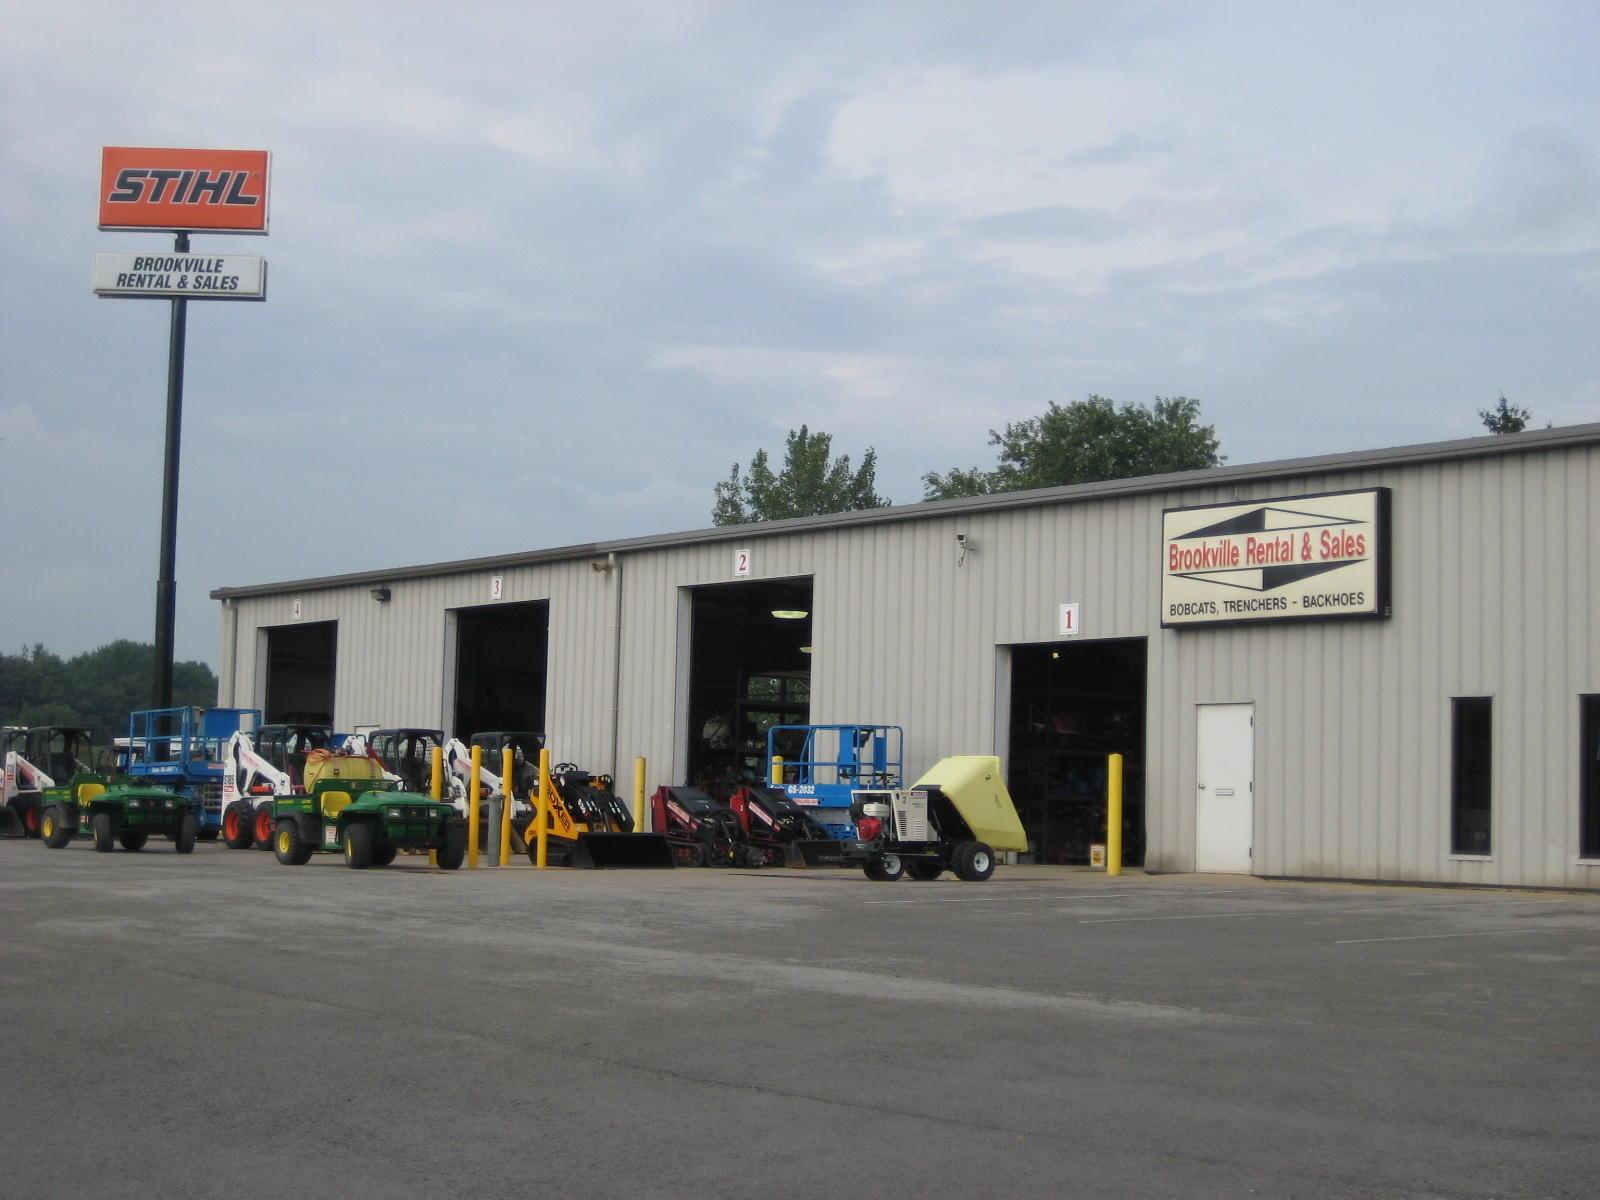 Brookville Rental & Sales image 6